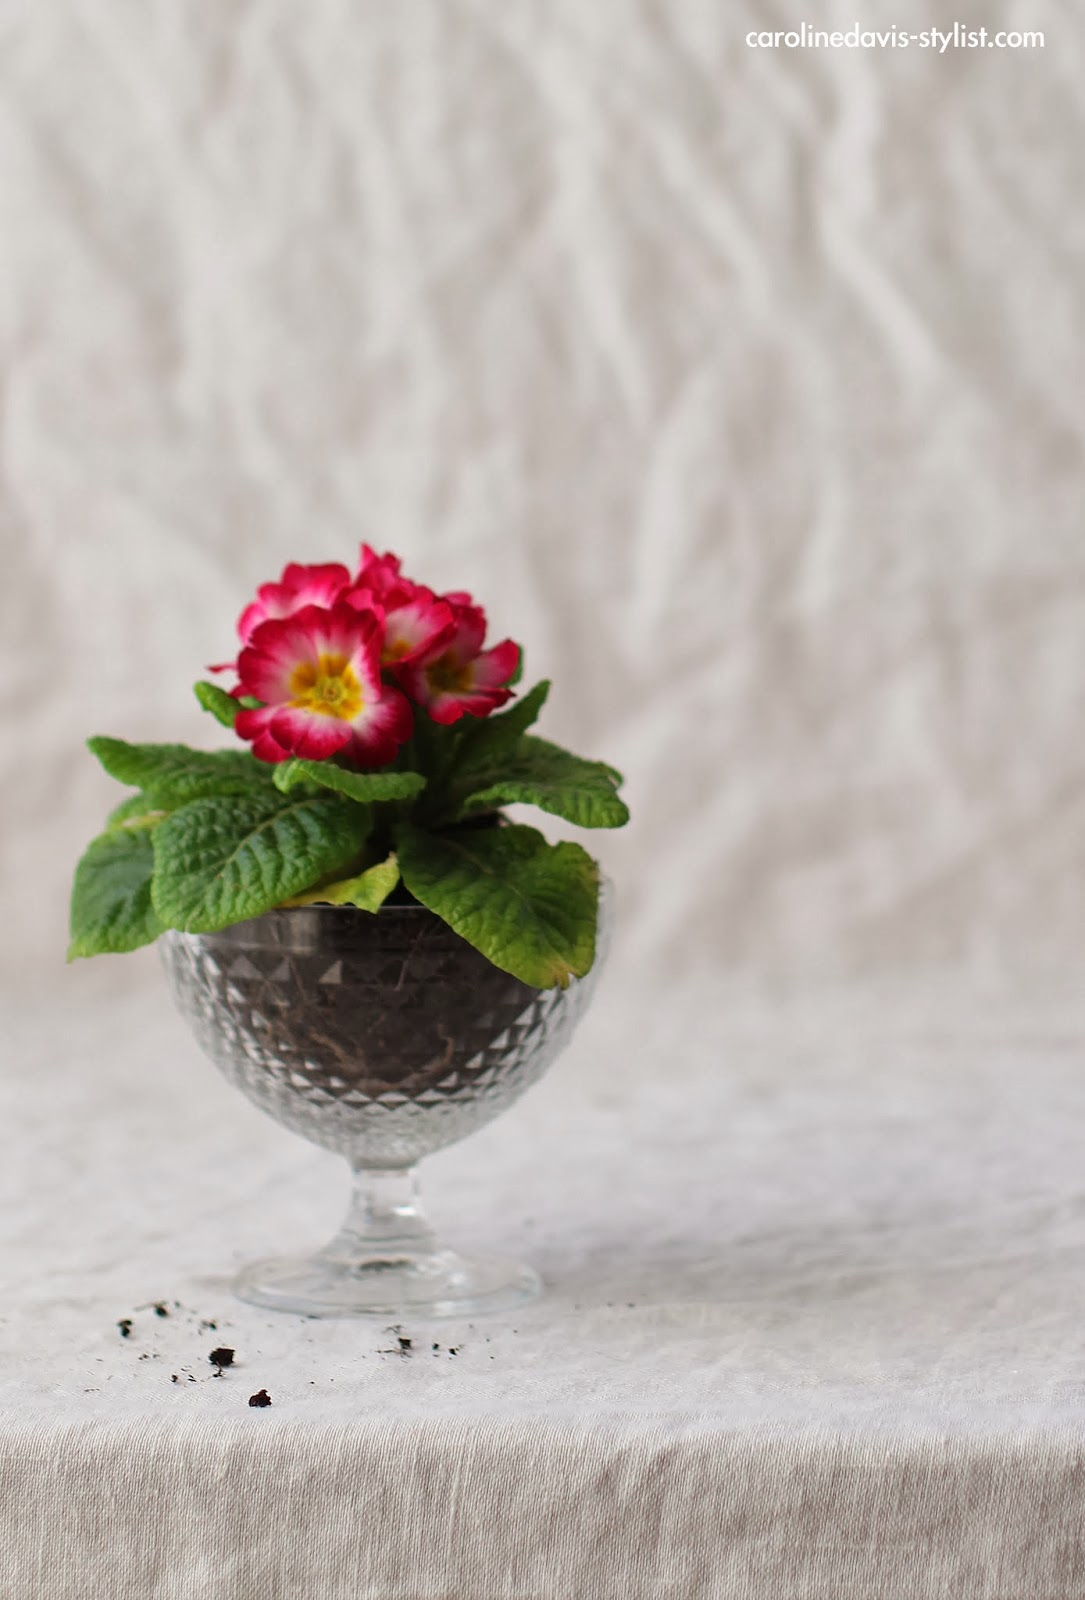 carolinedavis-stylist.com, styling details, flowers, trend-daily blog